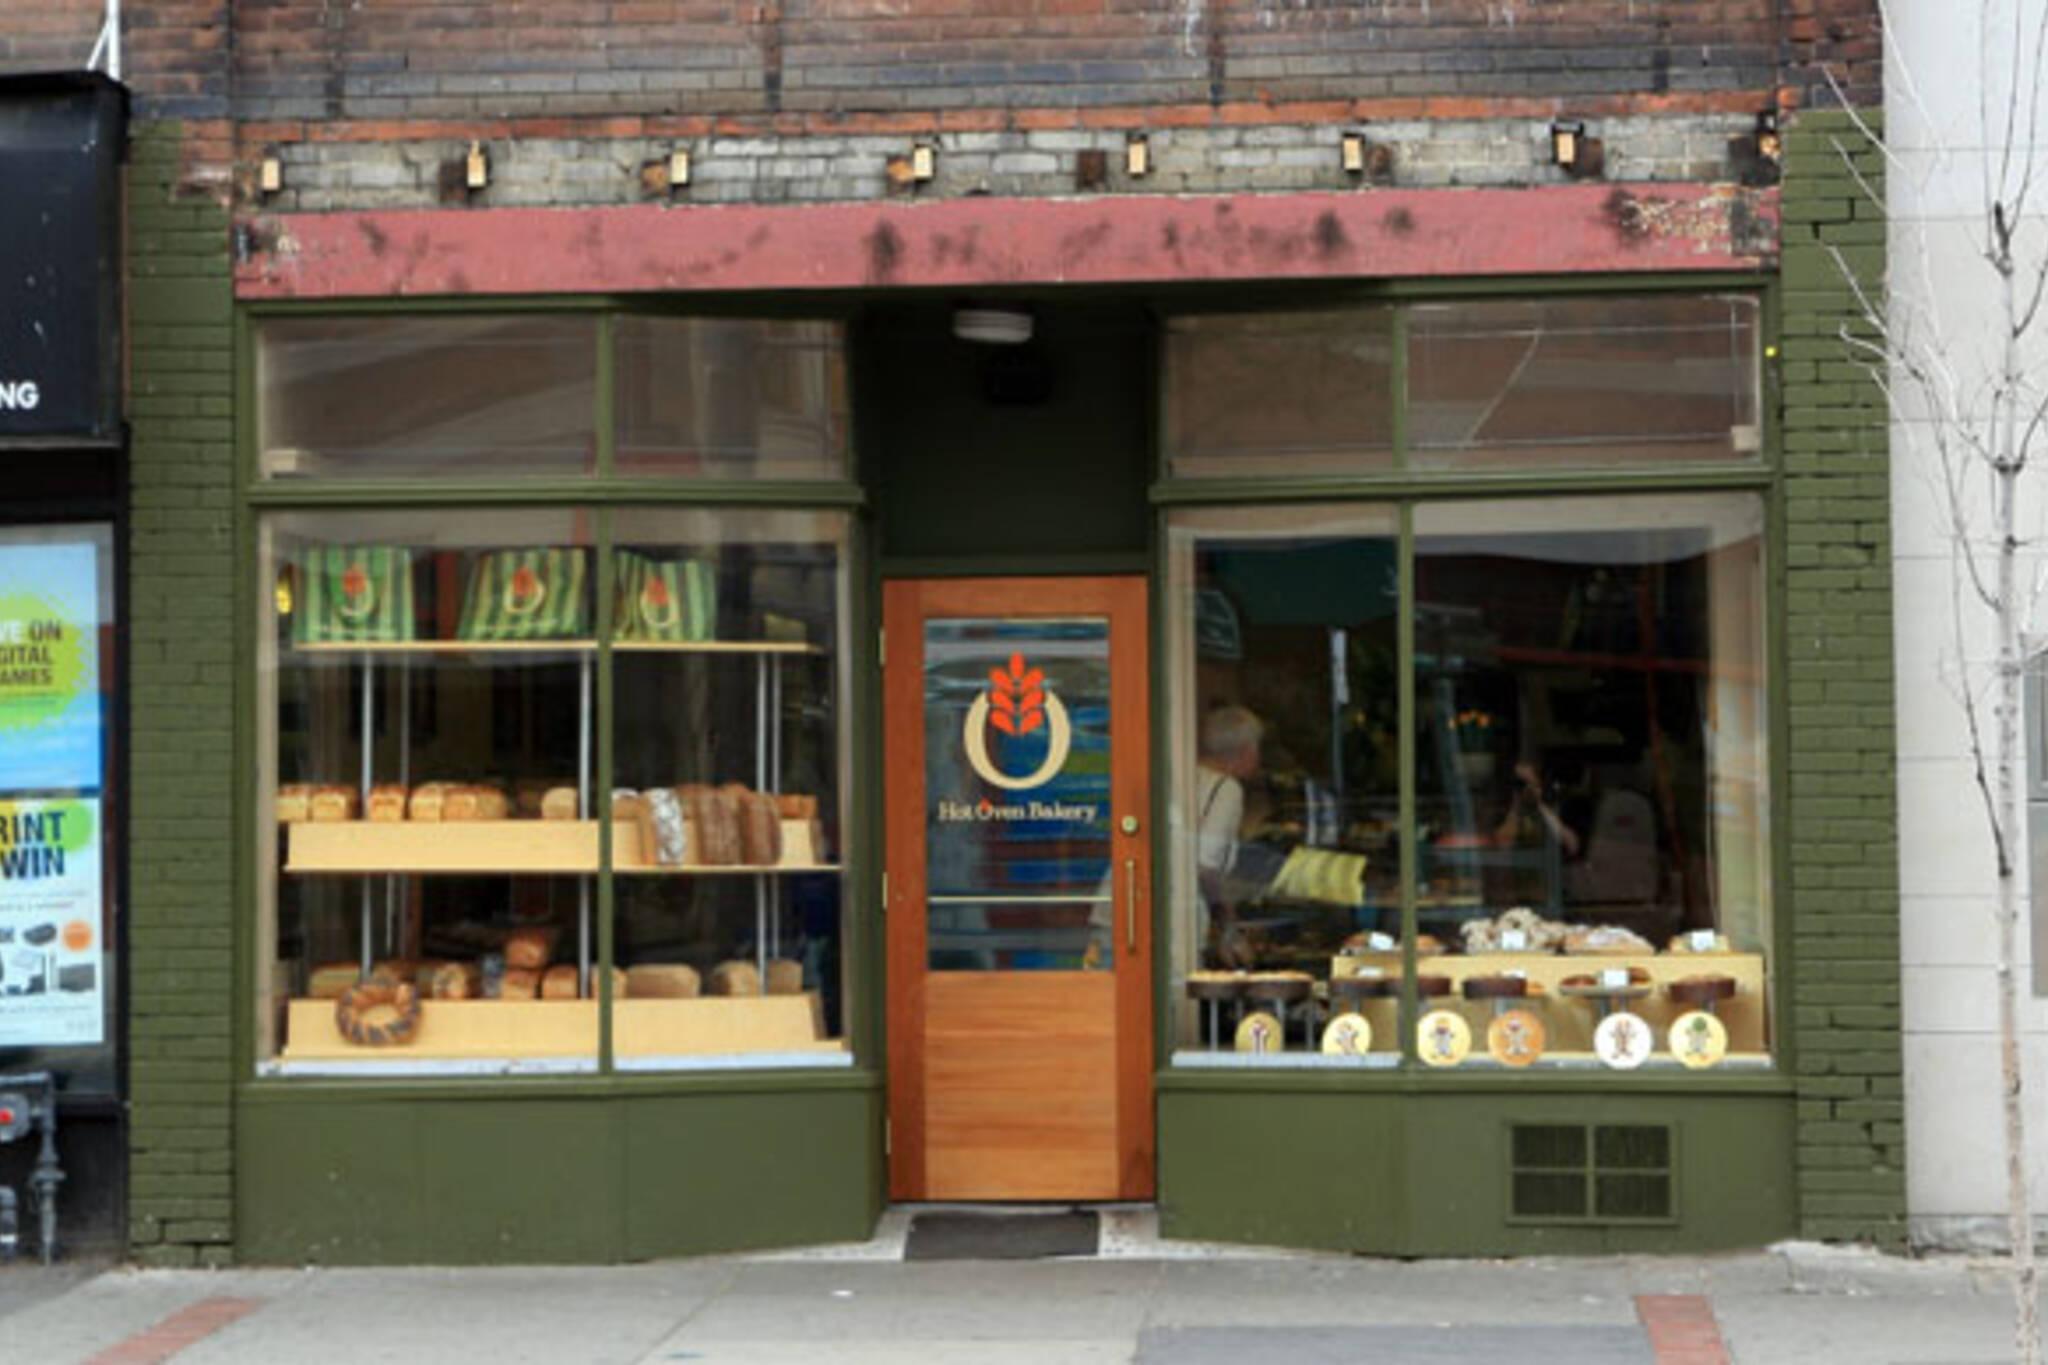 Hot Oven Bakery Toronto